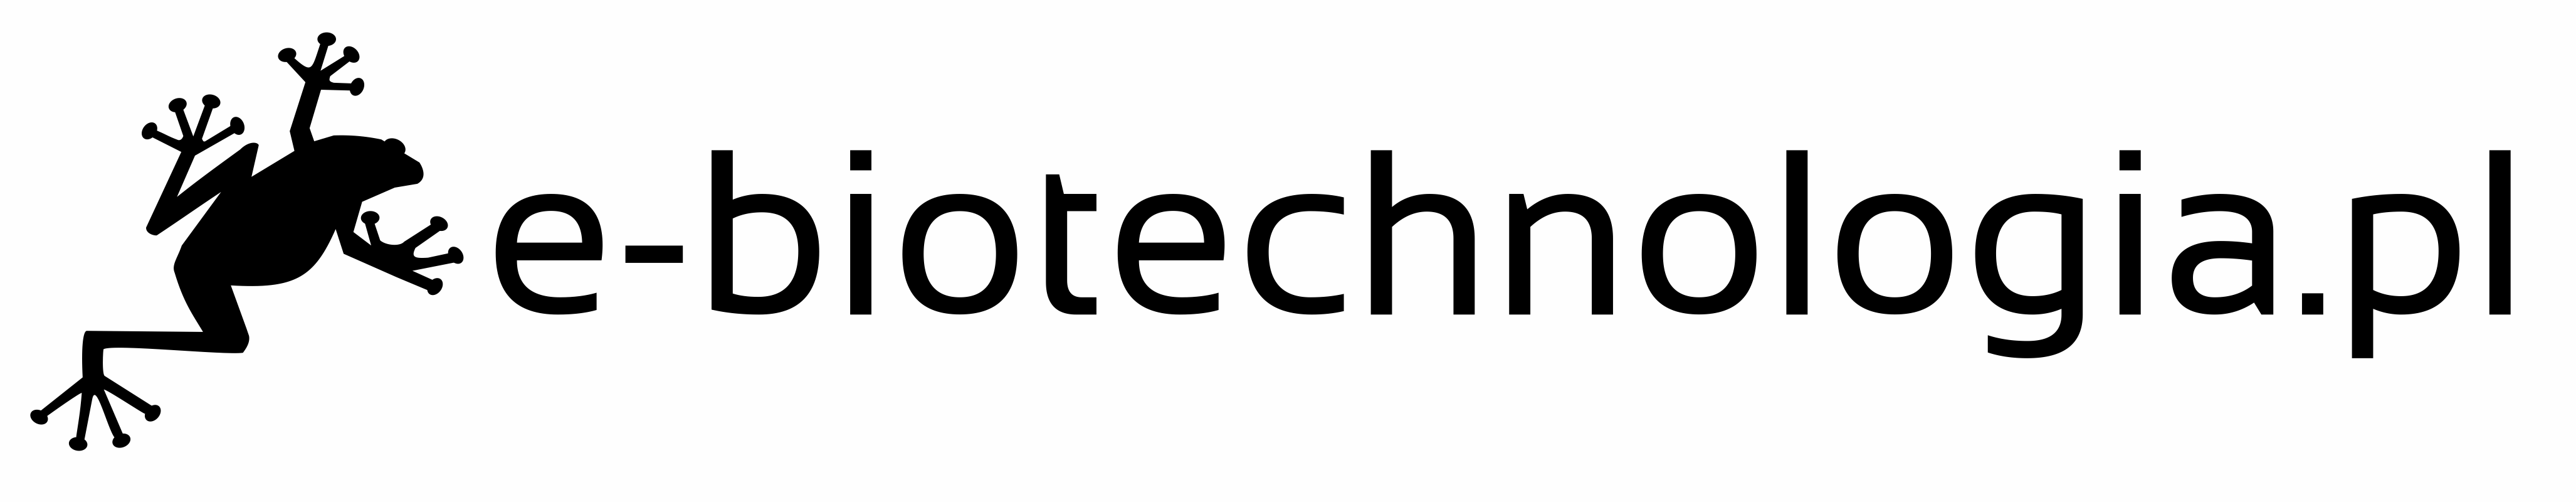 e-biotechnologia